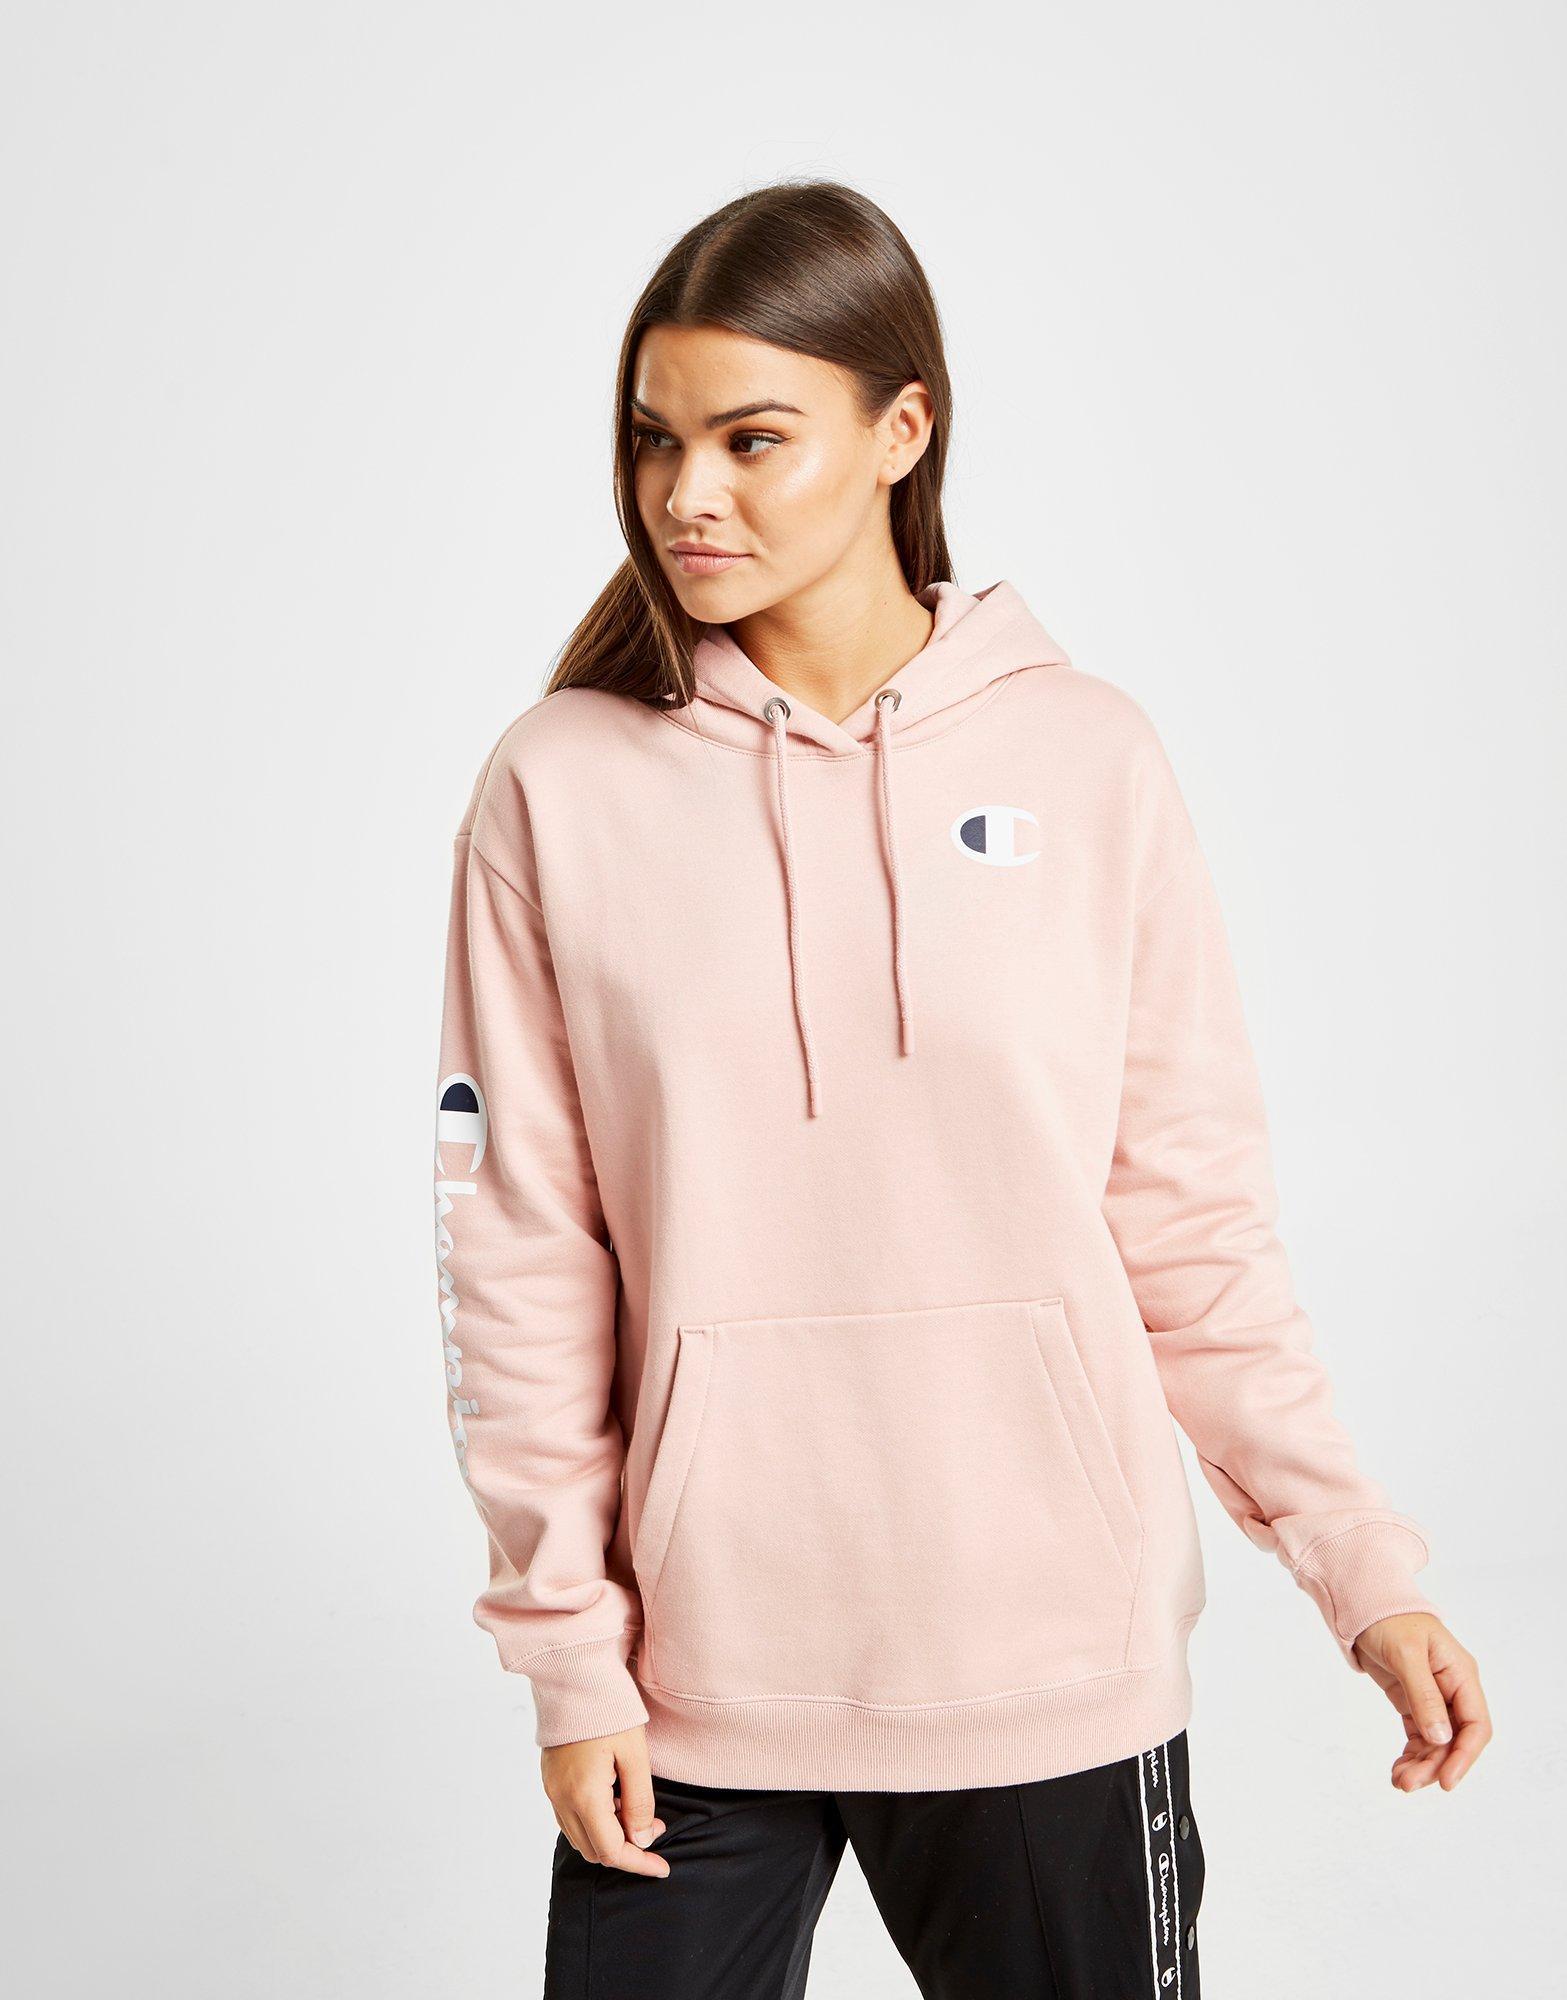 Sleeve Hoodie Champion Pink Script Boyfriend b6gf7y